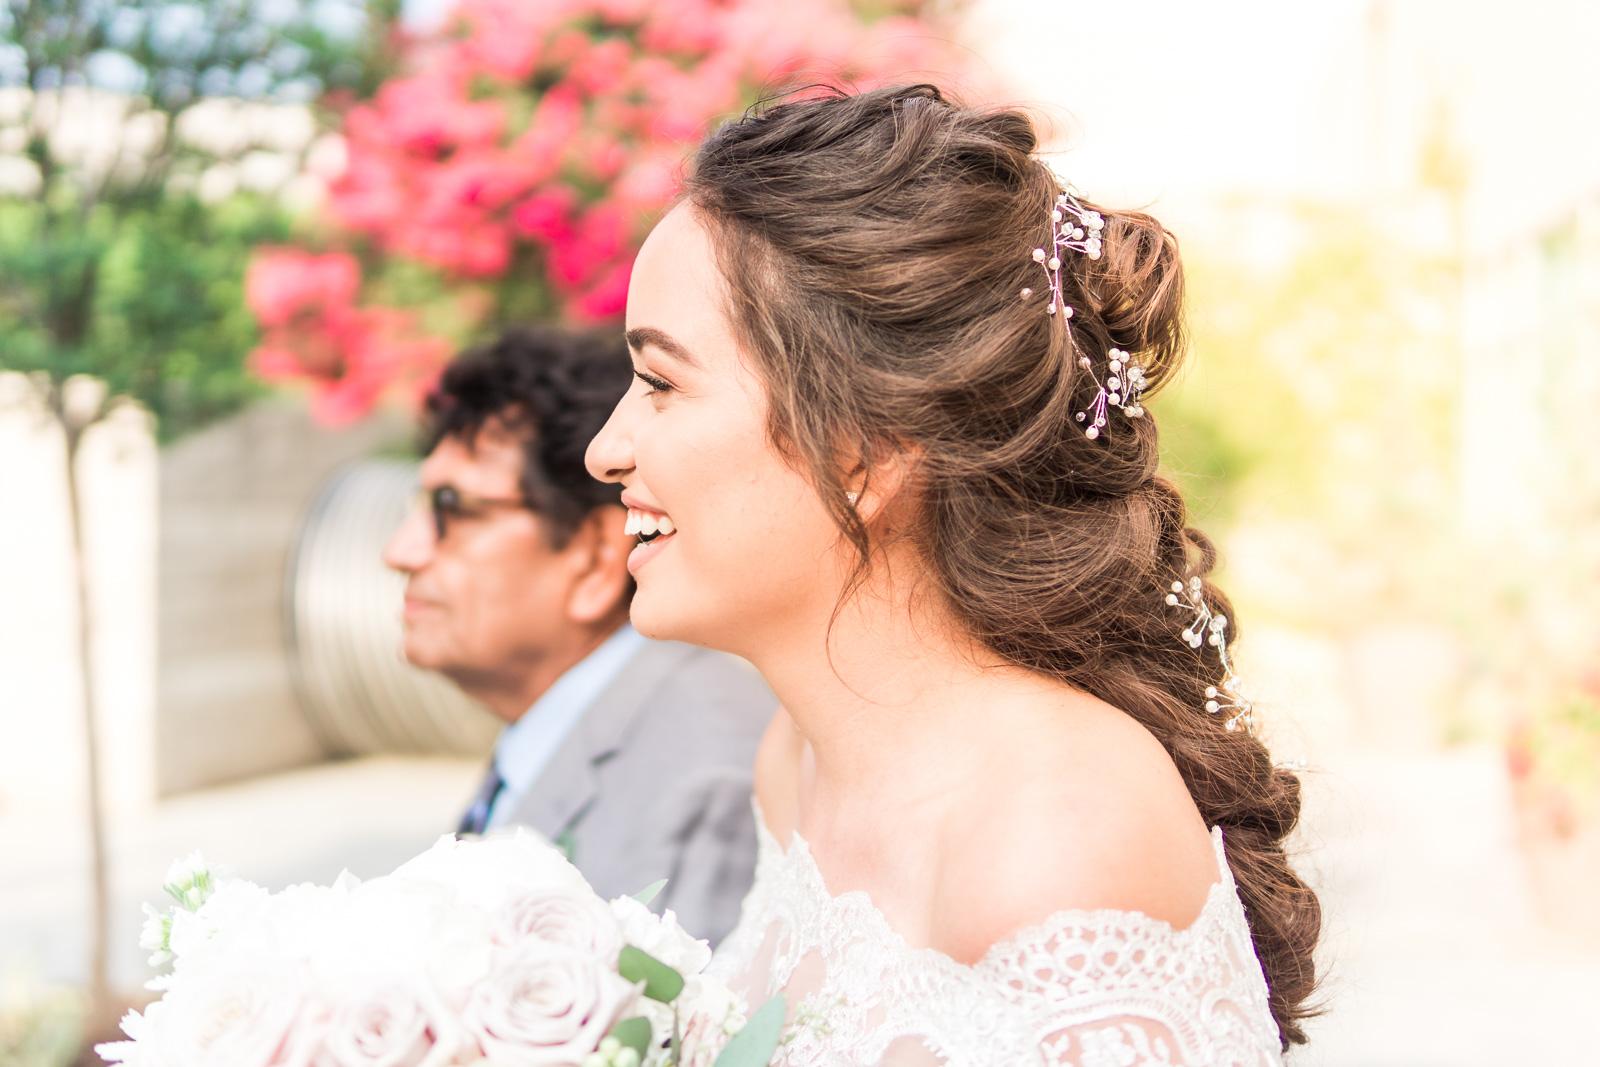 145_Angel-Brea-Orange-County_Joseph-Barber-Wedding-Photography.jpg